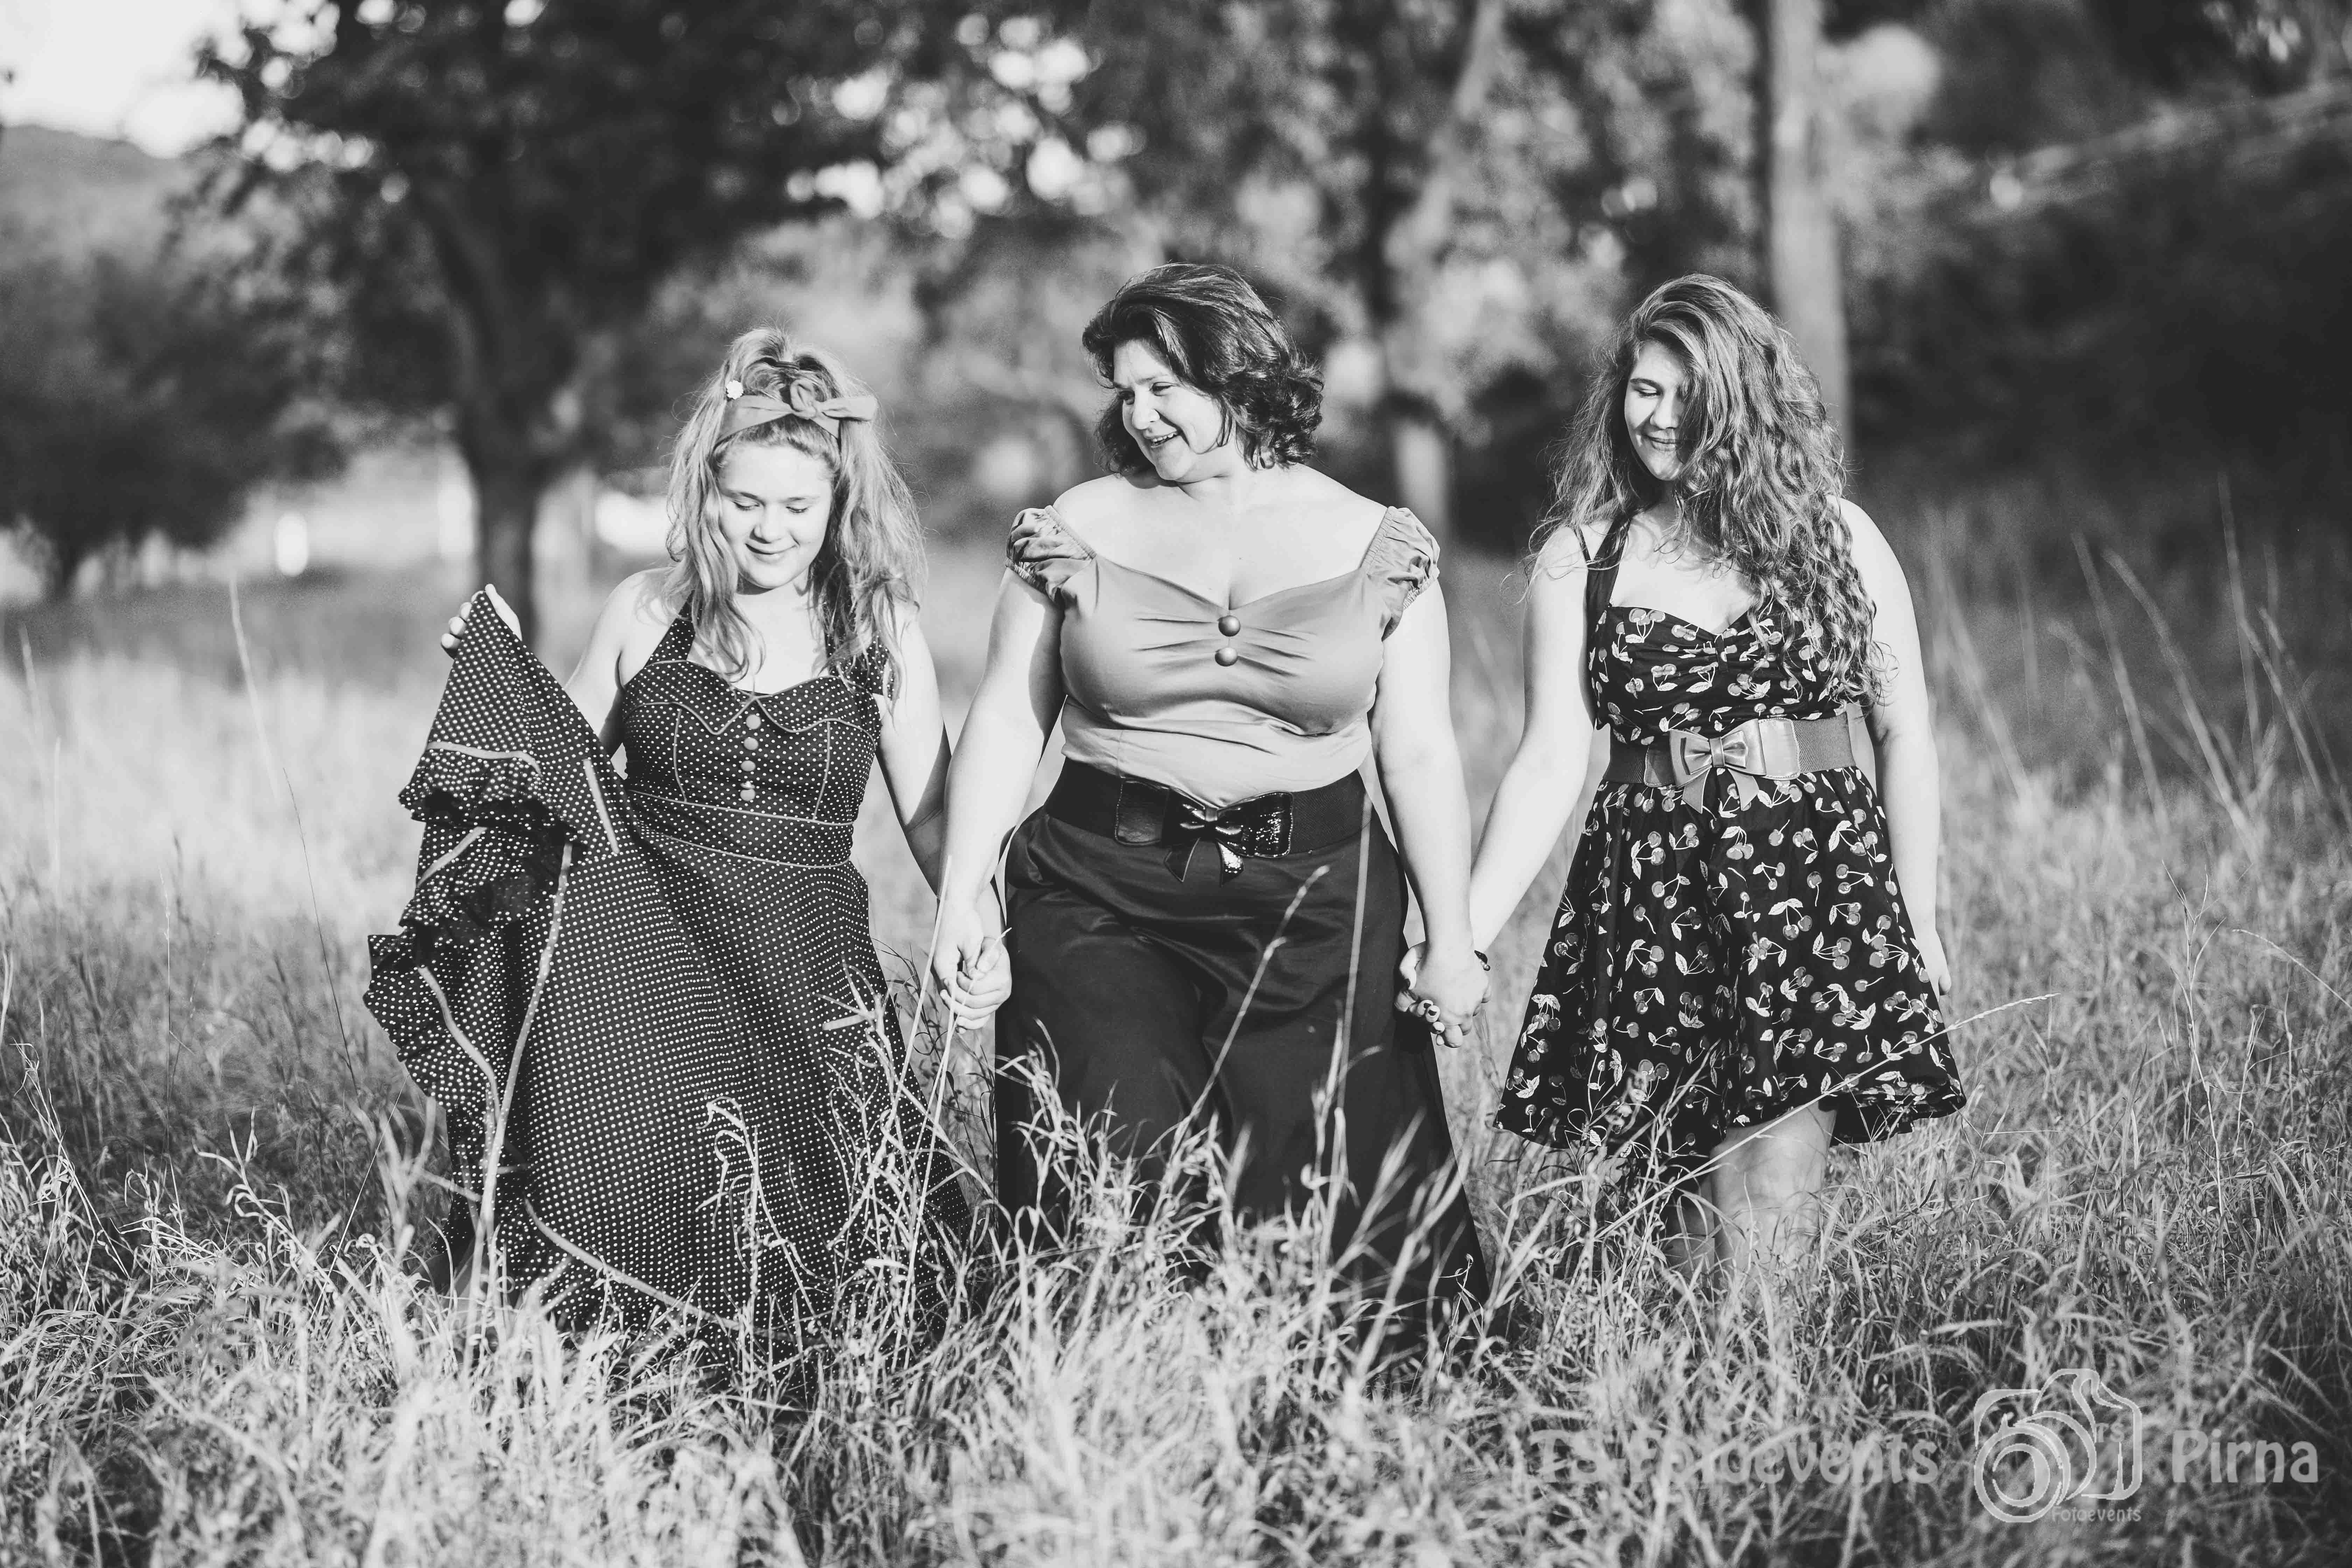 Familienshooting Mädels Spätsommer